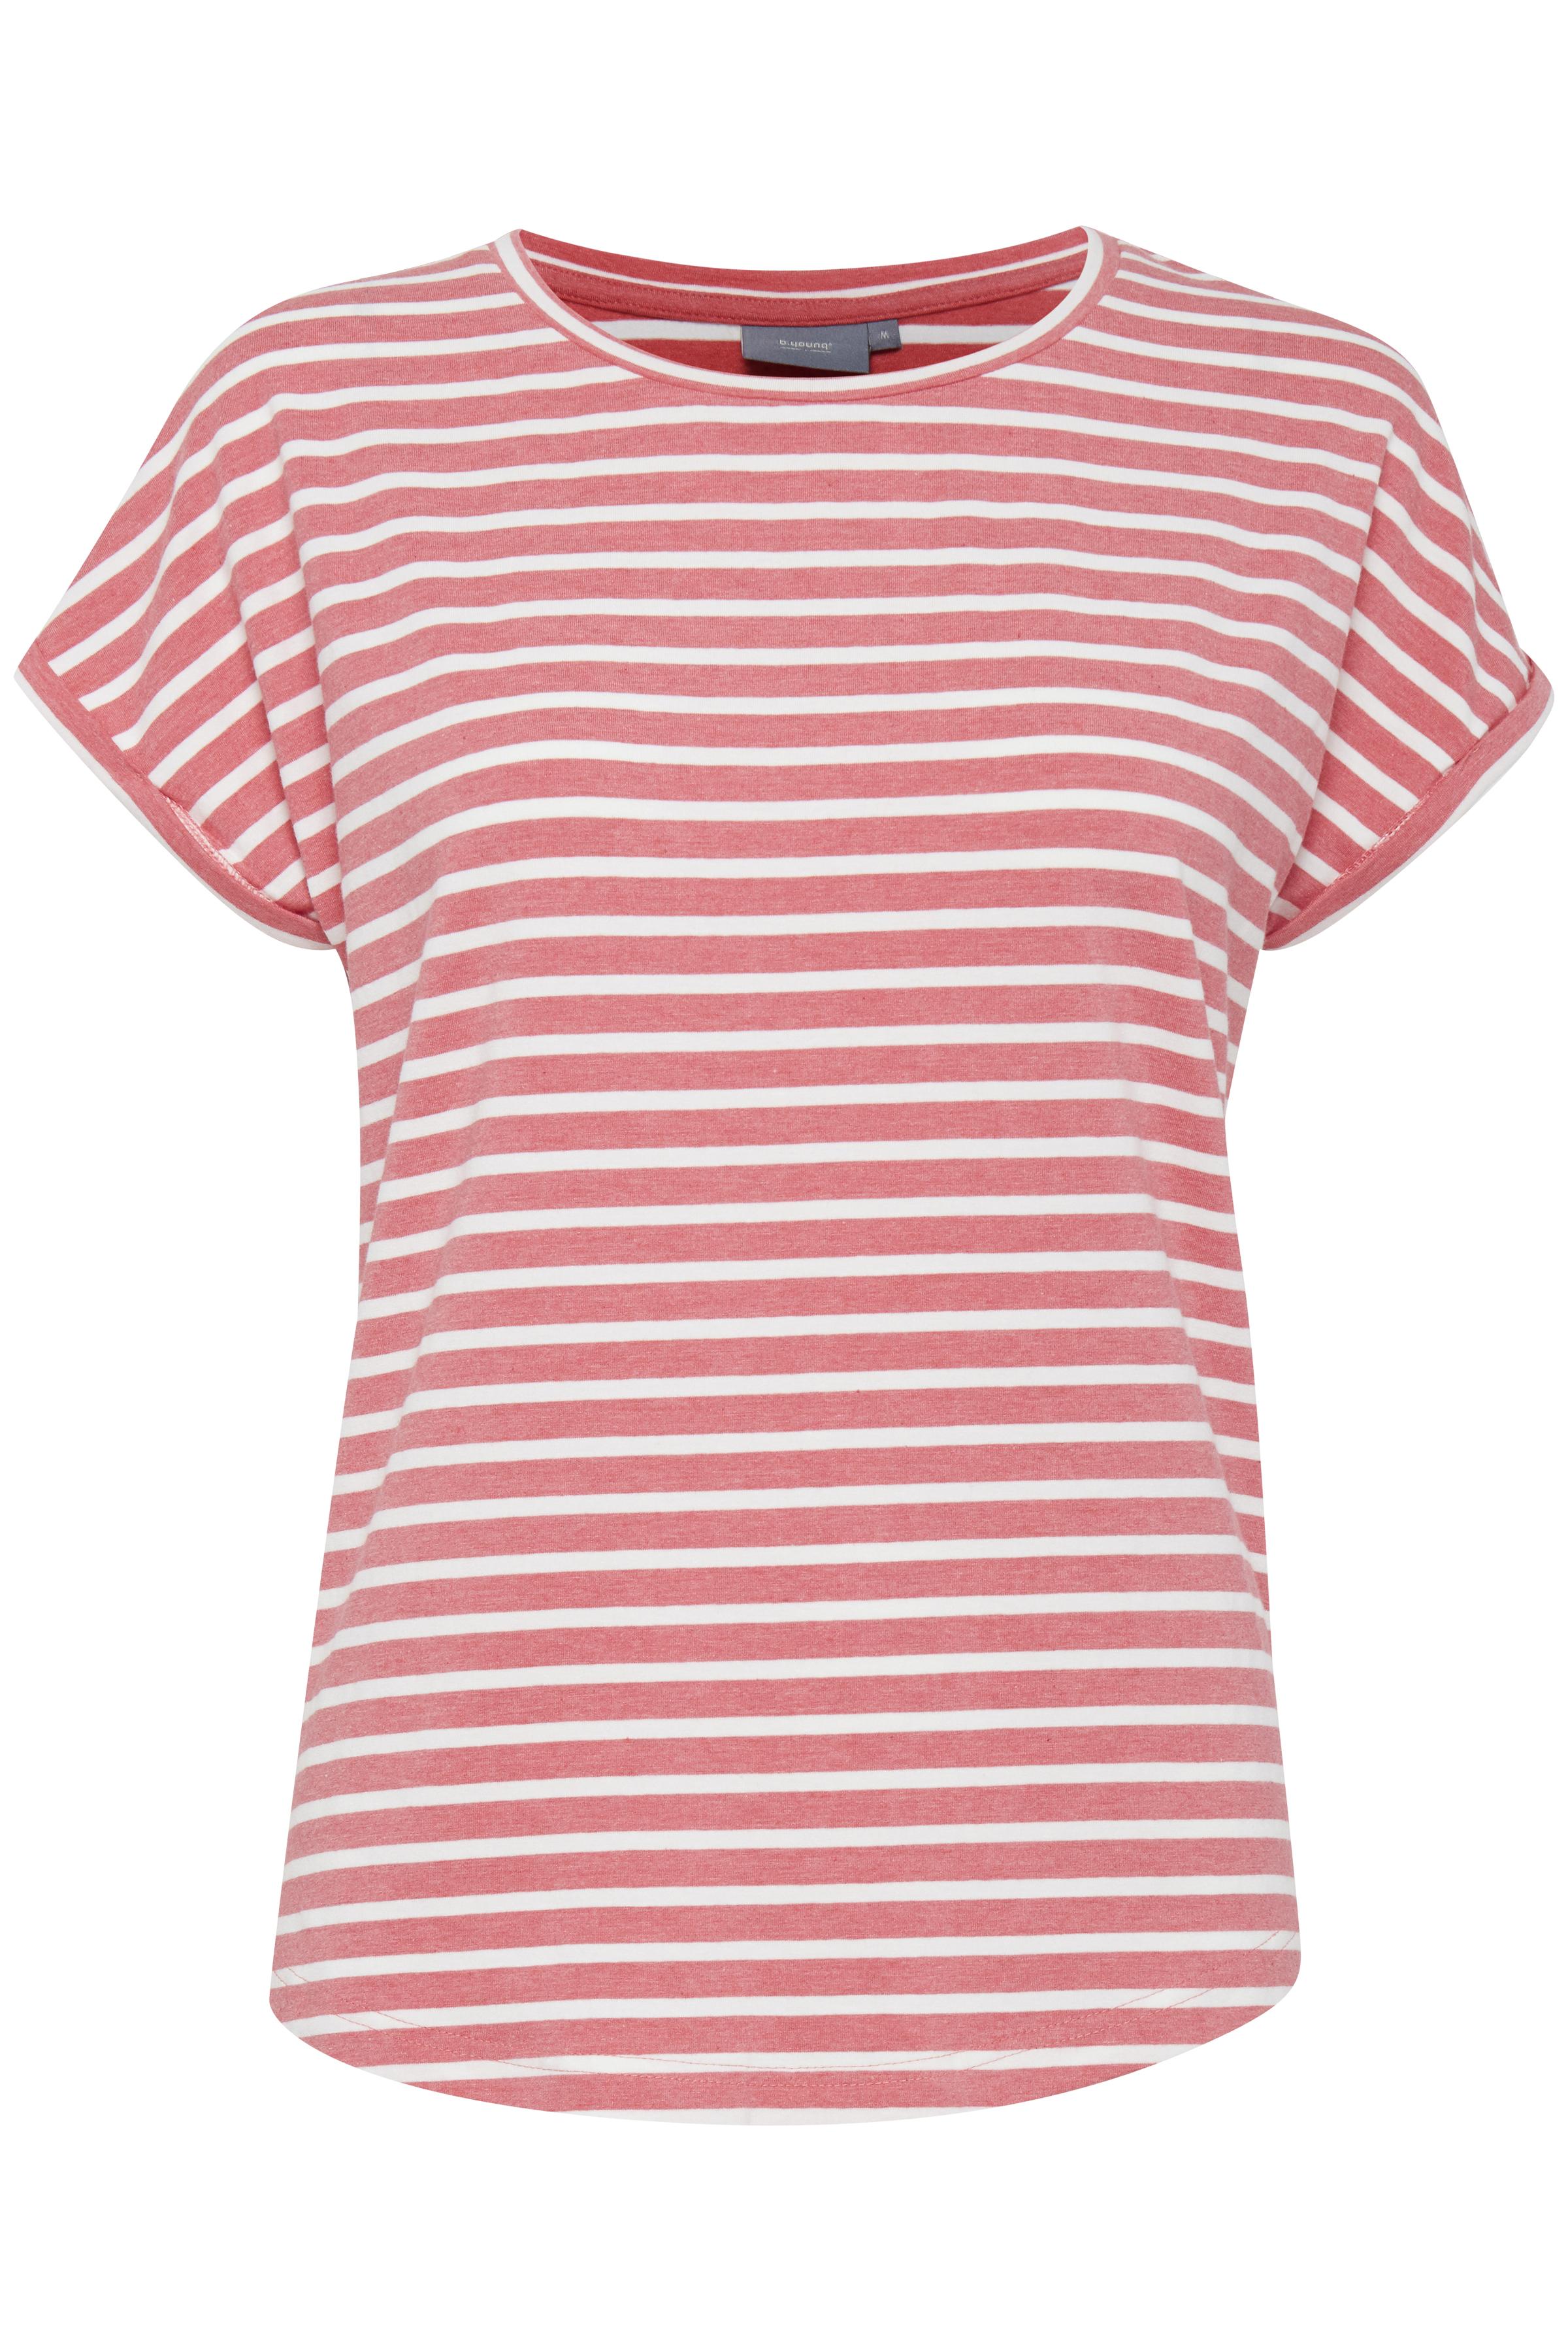 Striped Sunkist Coral Mel.